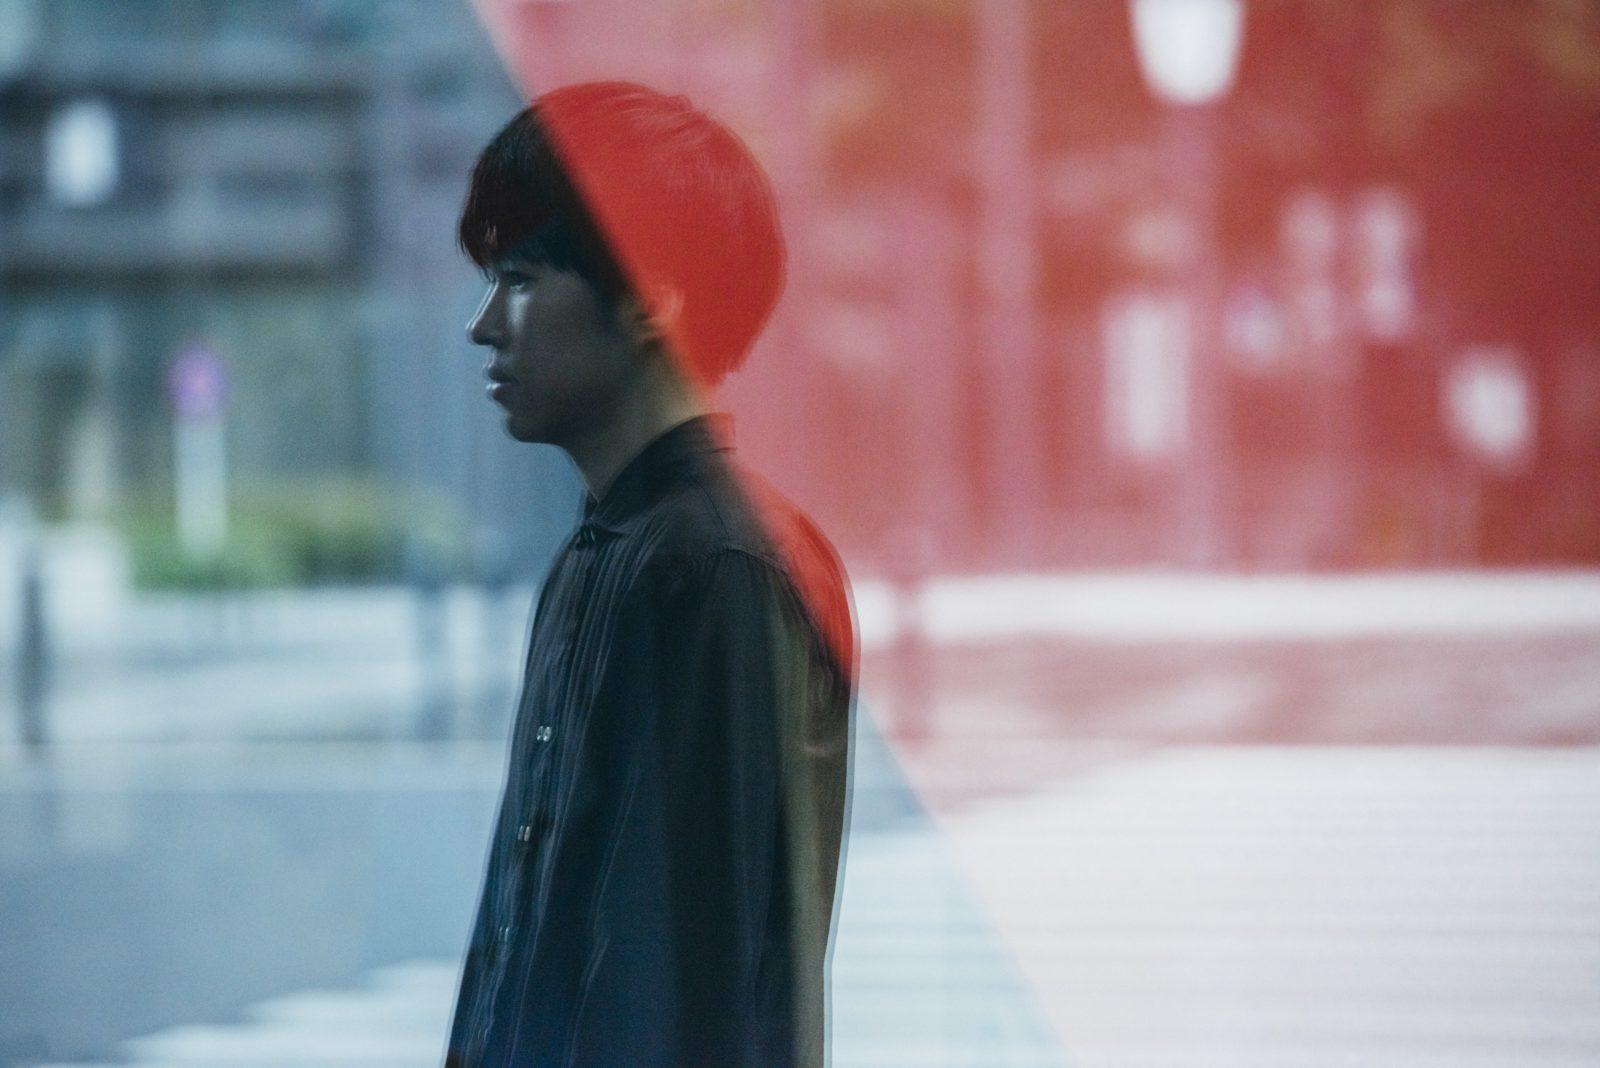 Okada Takuro、Mitski来日ツアー東京公演のゲストアクト出演が決定! 「硝子瓶のアイロニー」のMVも公開サムネイル画像